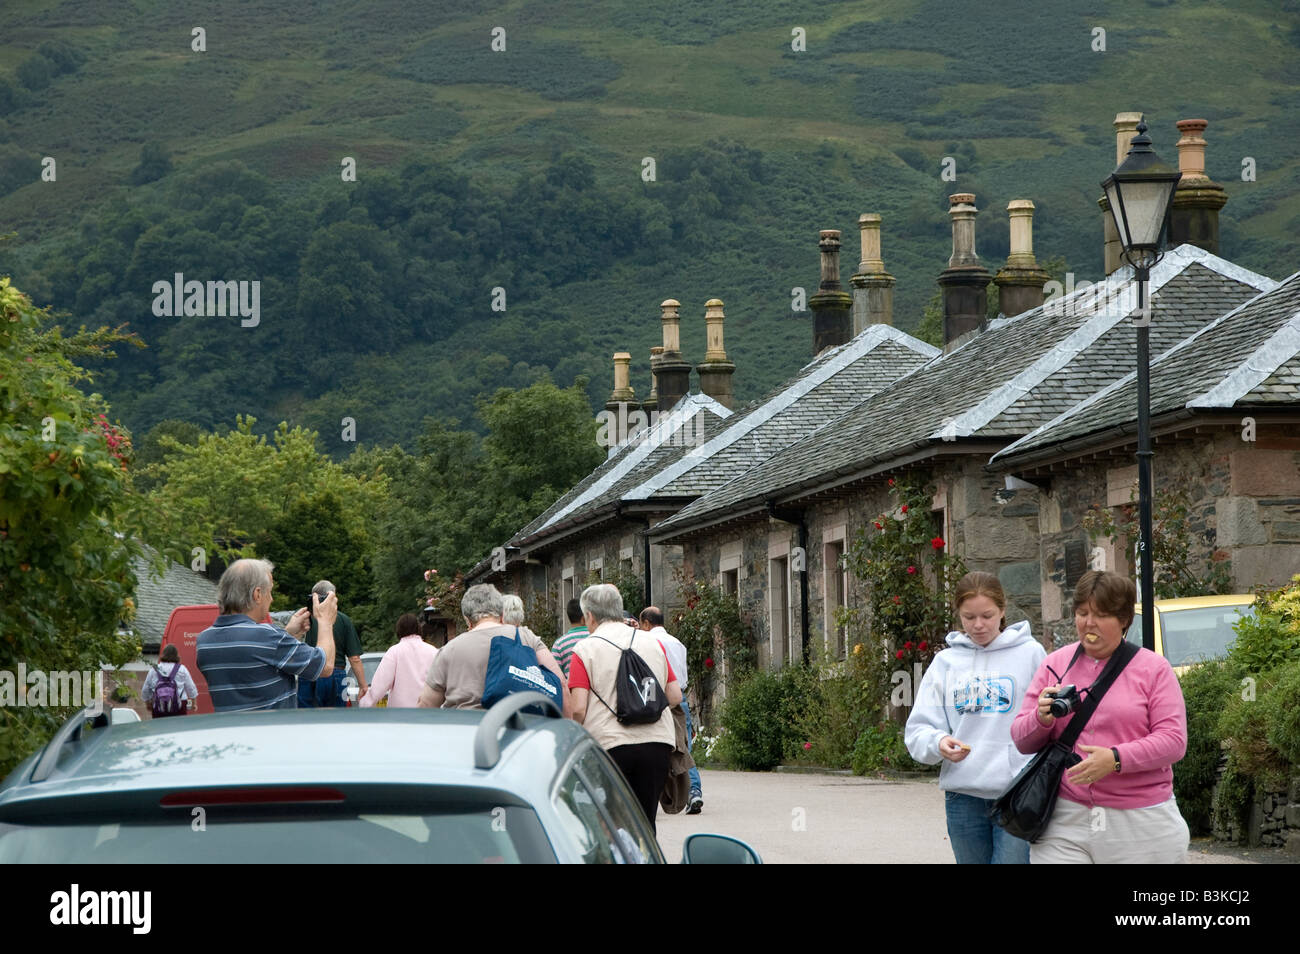 Village of Luss, Loch Lomond - Stock Image